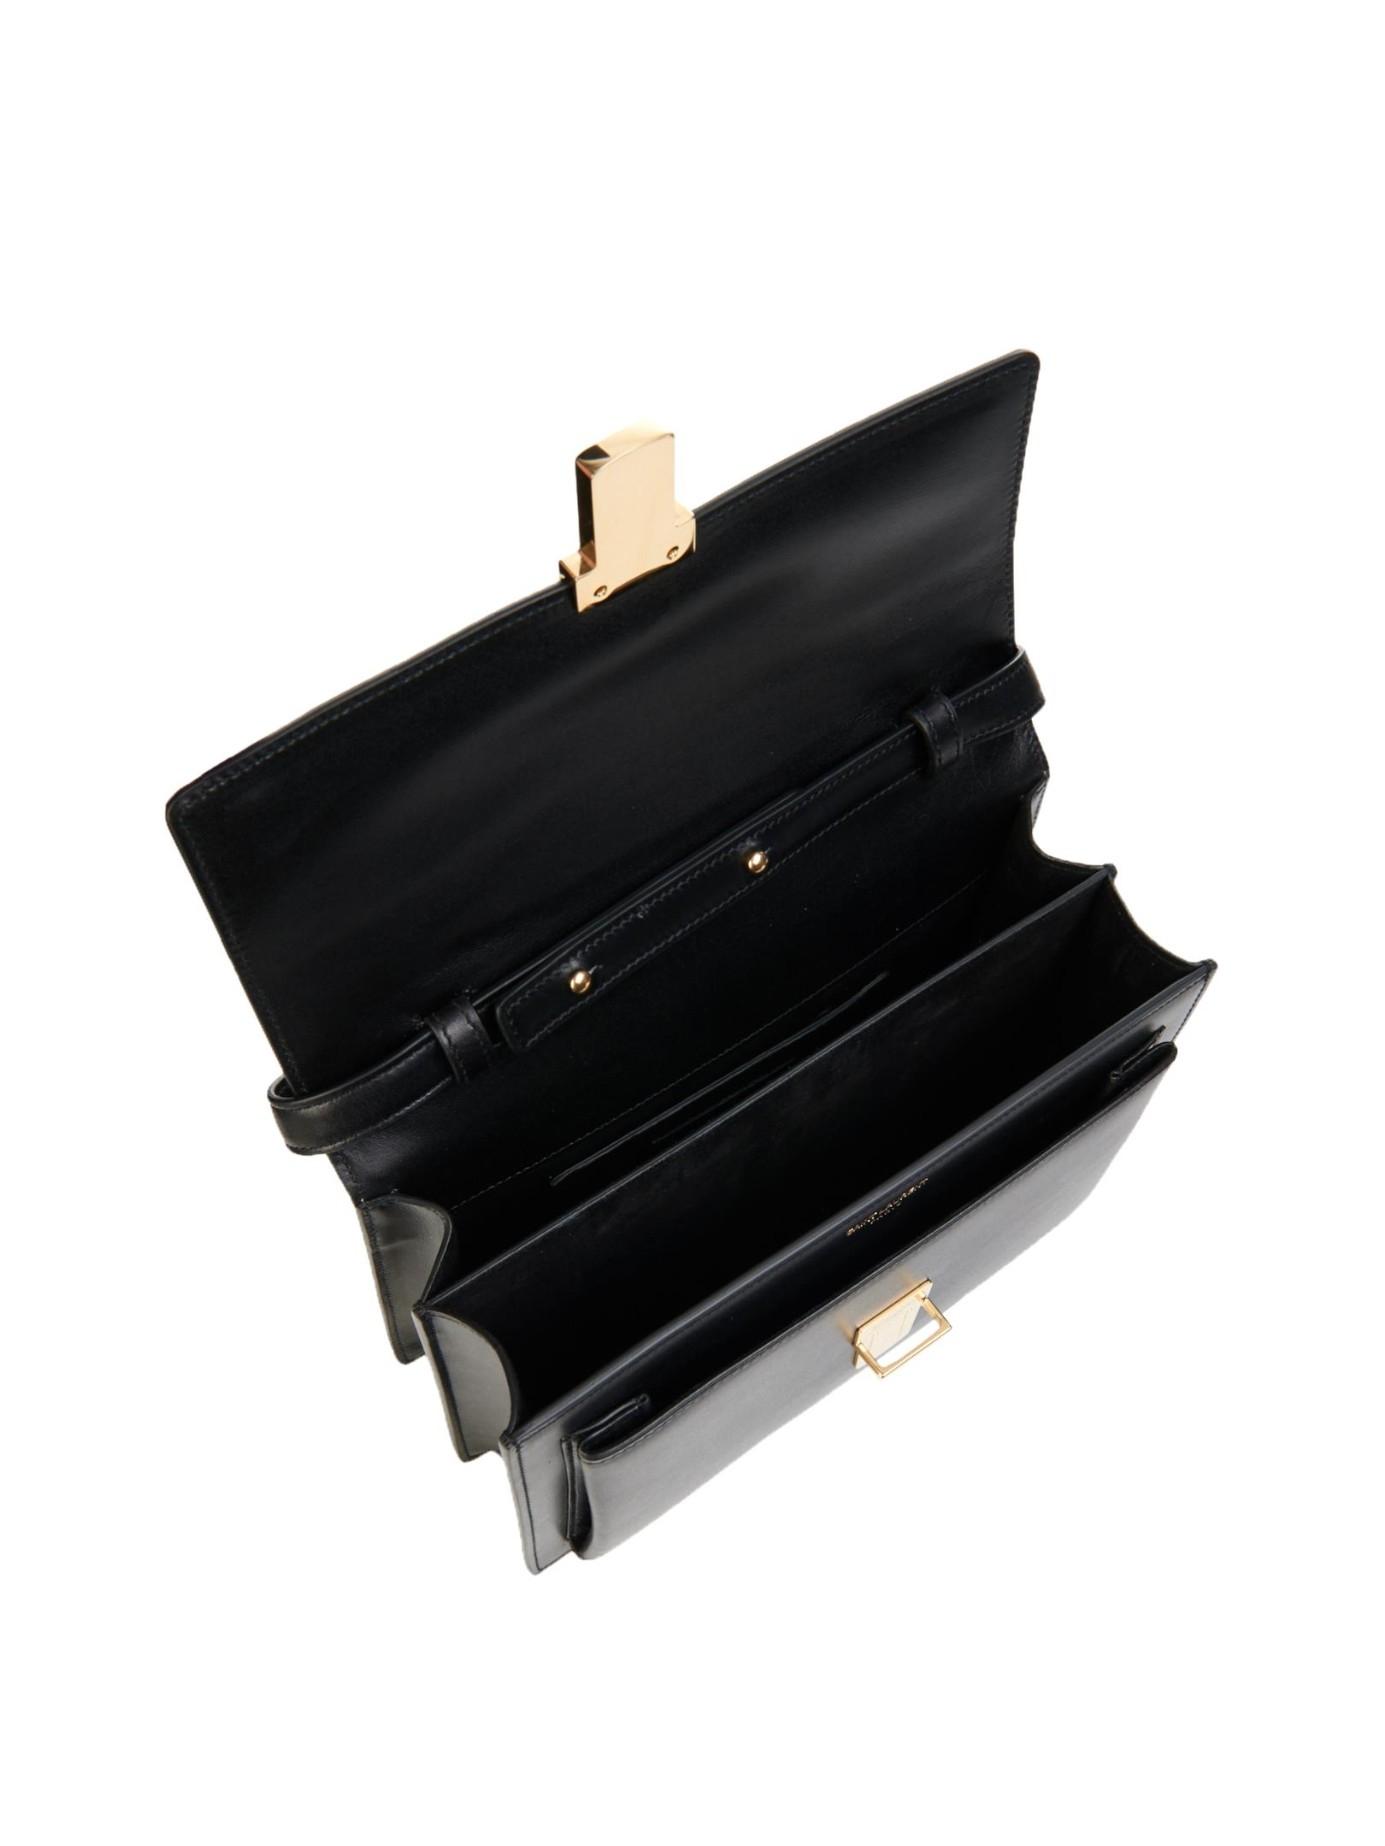 yves saint laurent bags online - Saint laurent High School Medium Leather Shoulder Bag in Black | Lyst